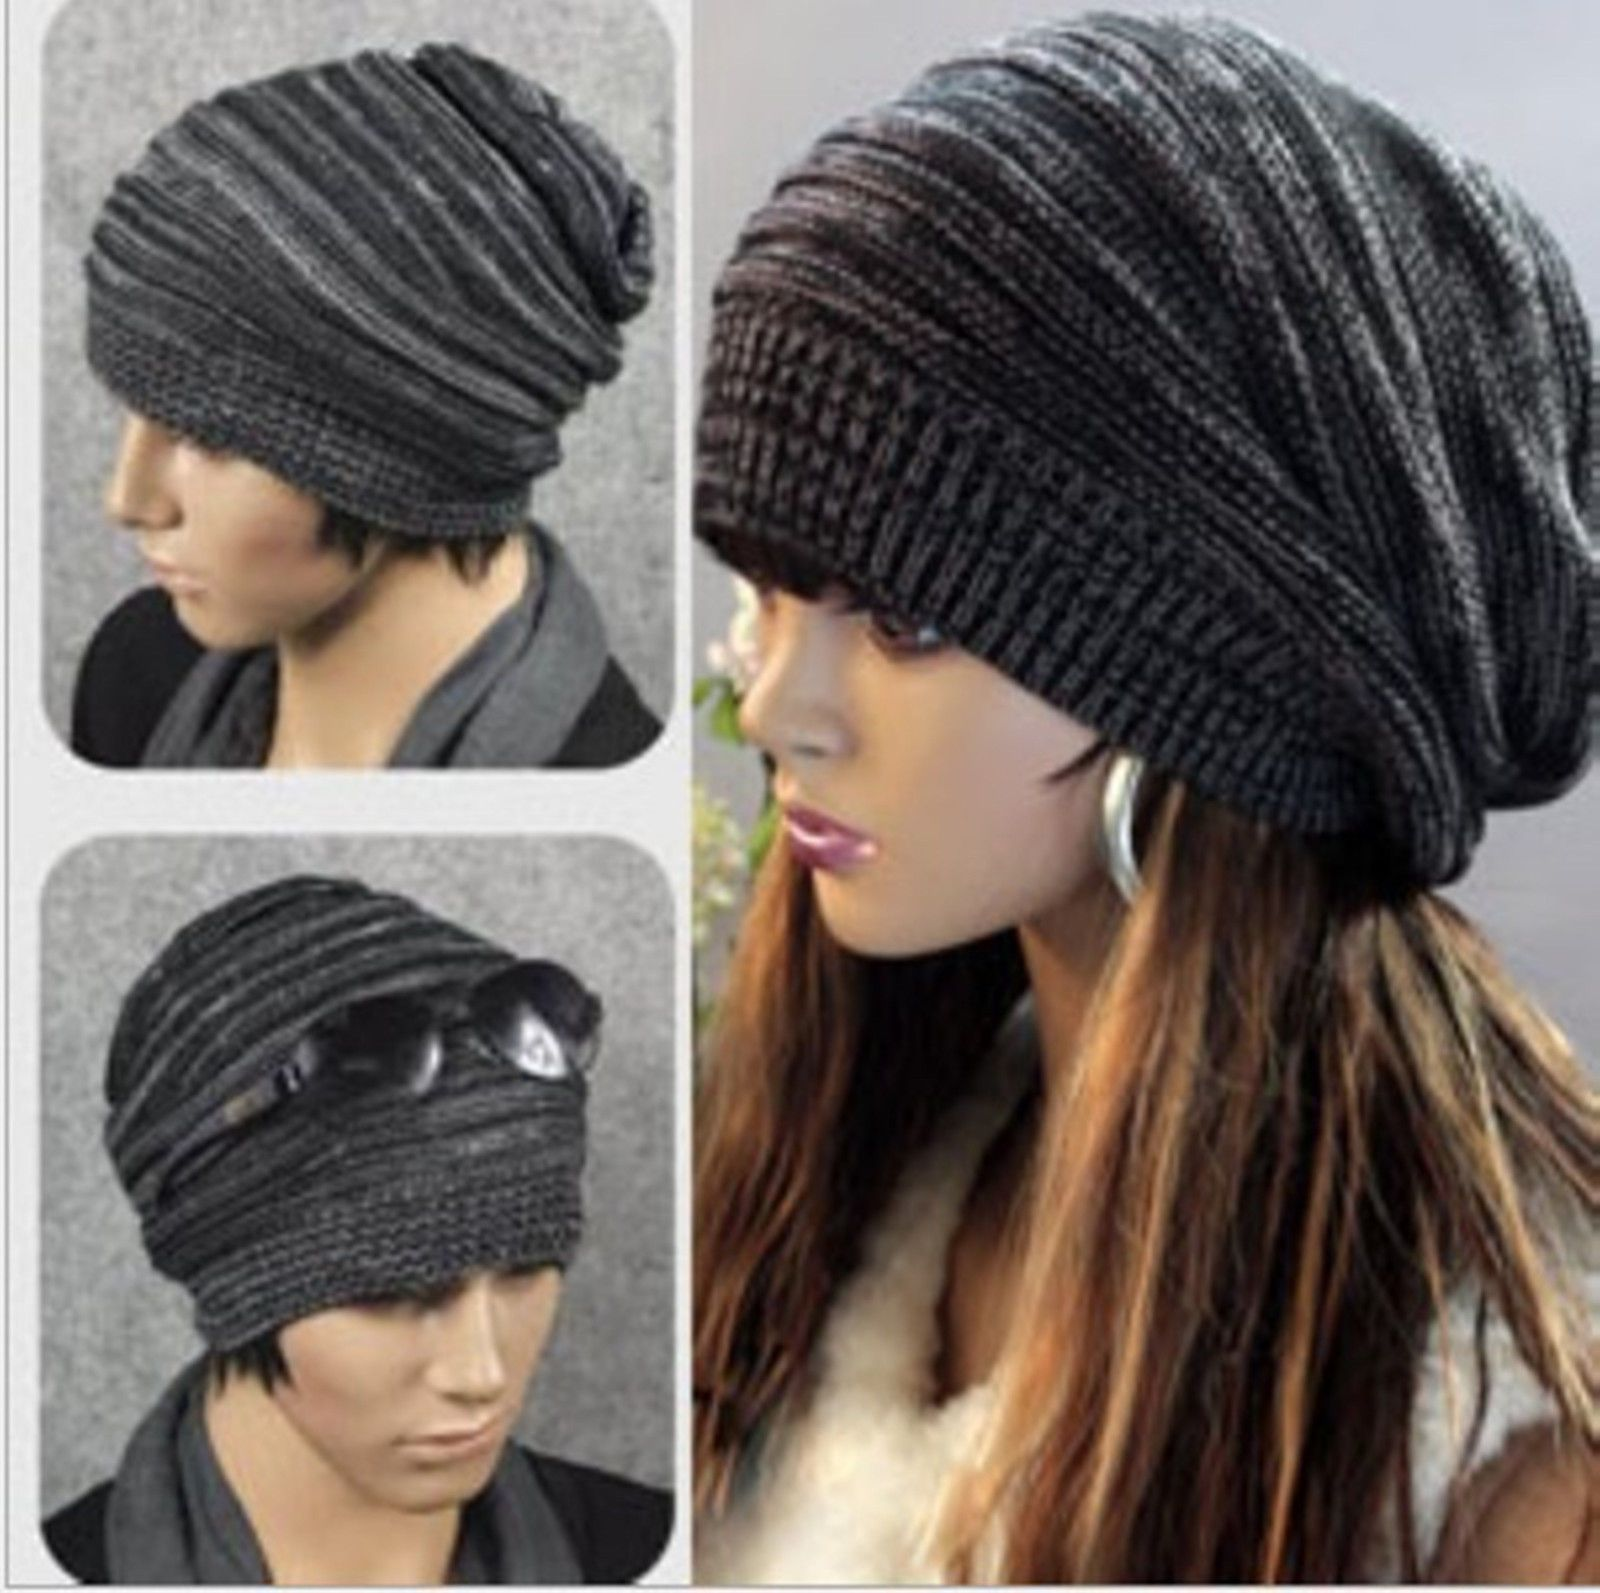 New Unisex Womens Mens Knit Baggy Beanie Hat Winter Warm Oversized Ski Cap  | eBay